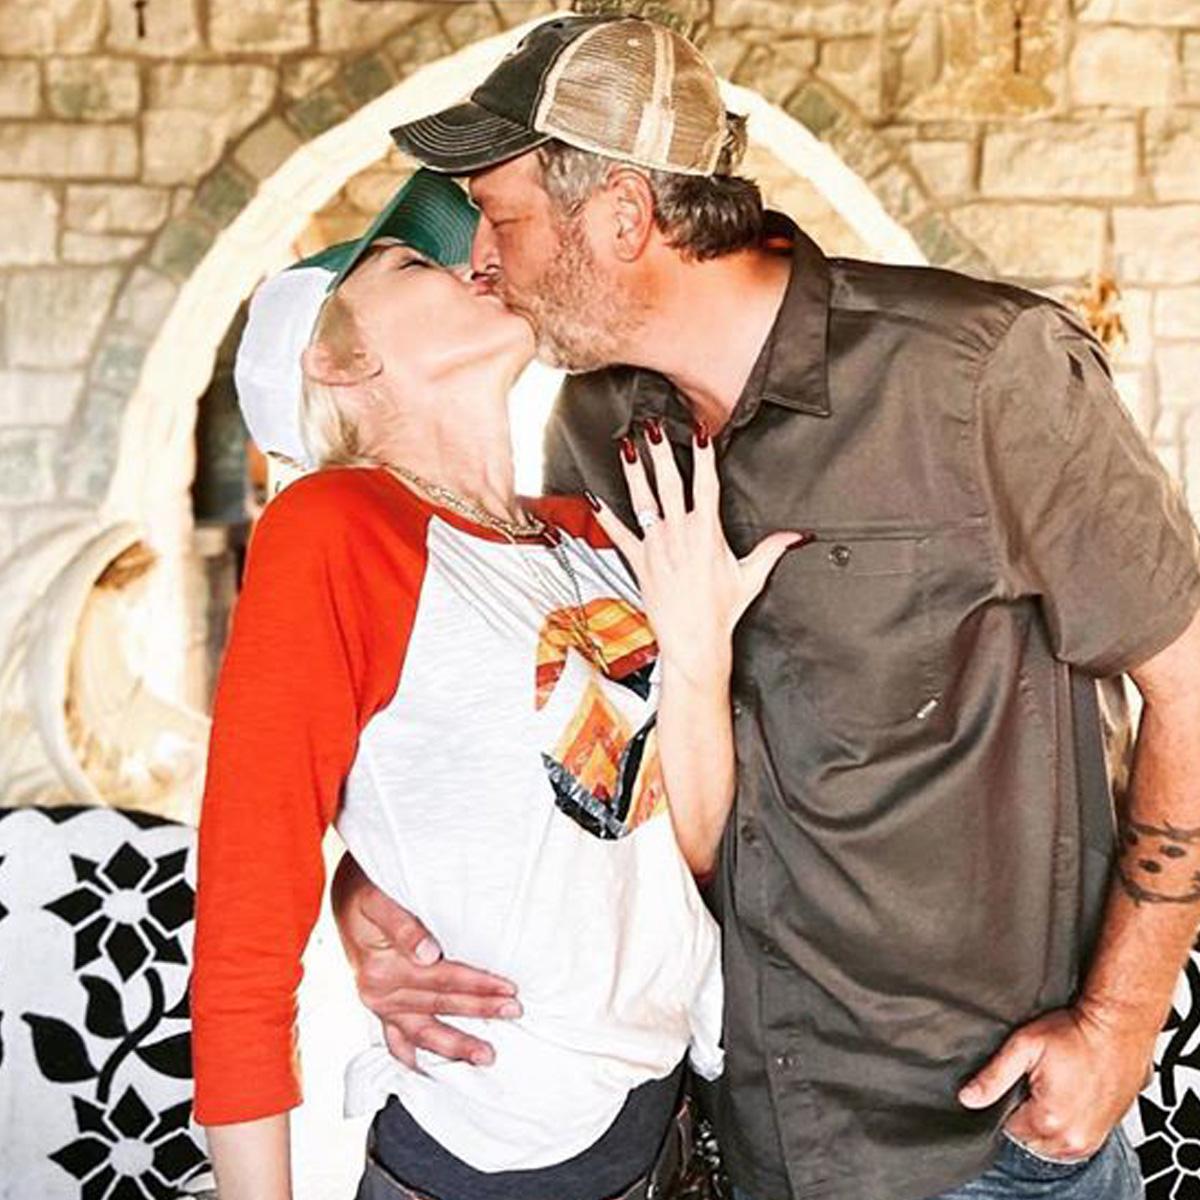 How Blake Shelton and Gwen Stefani Are Celebrating Their First Thanksgiving Engaged